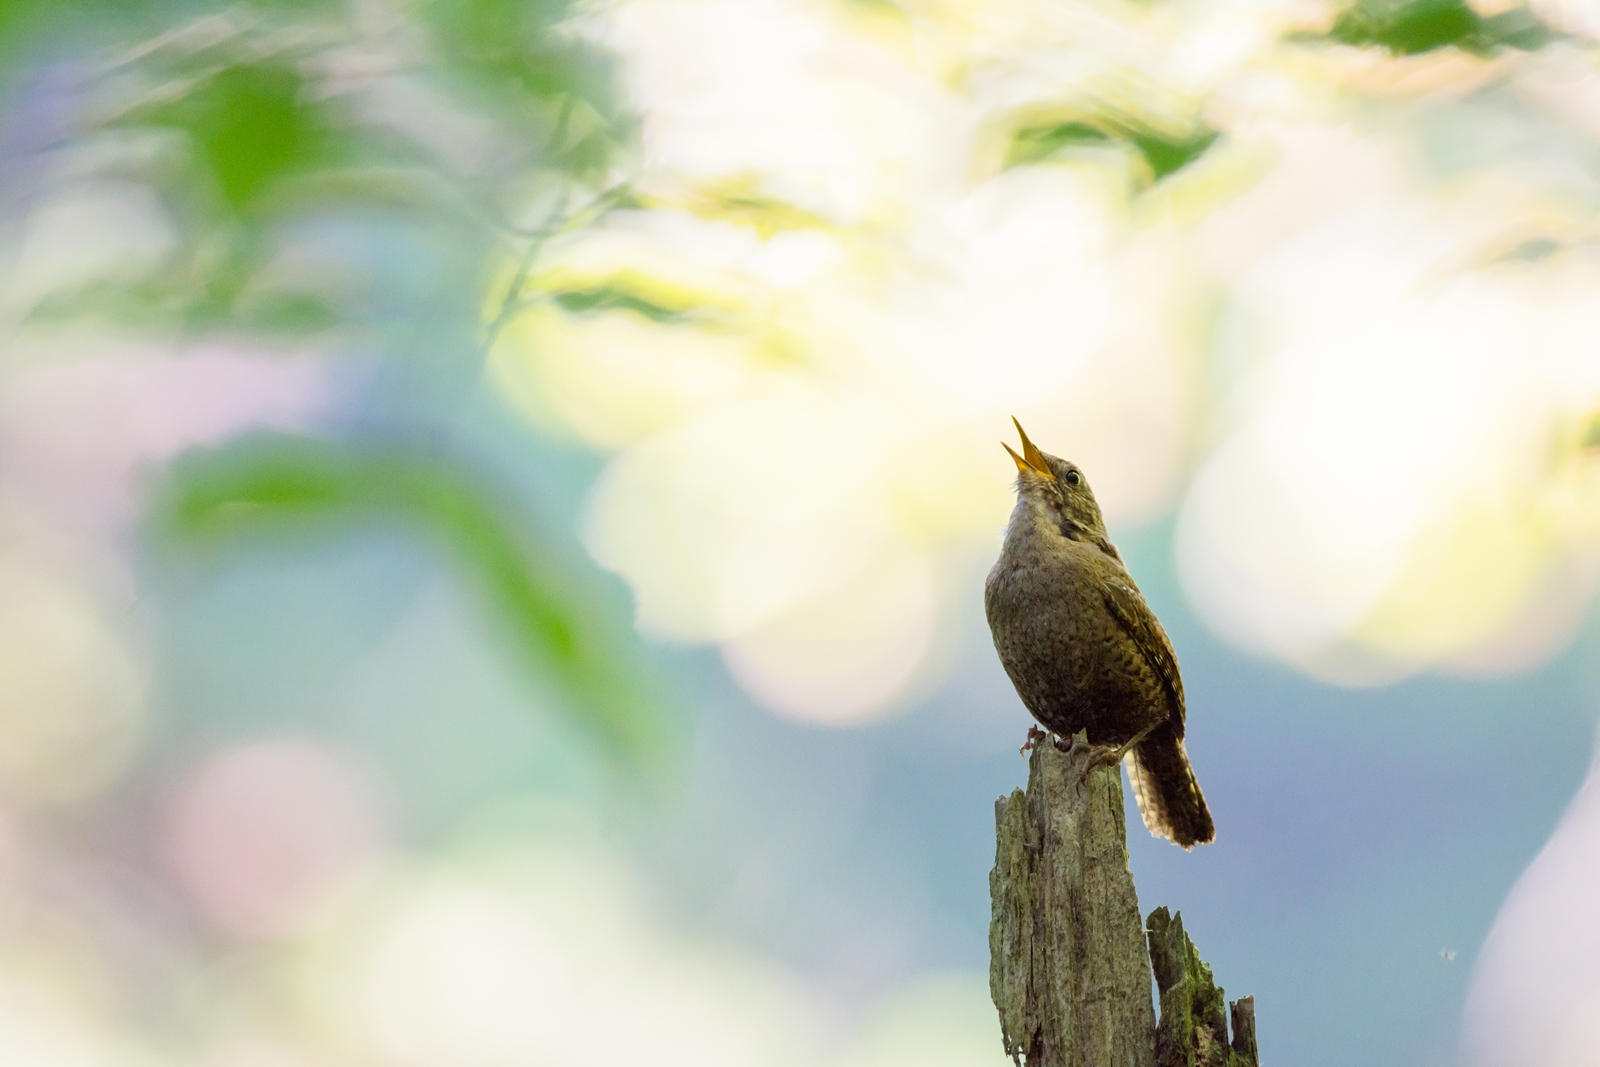 Photo: そこにいること Proof of existence.  水の流れる音 虫たちの鳴く音 渓流に満ちる音 その中で負けずに声をあげる そこにいる 存在を示すために  Eurasian Wren. (ミソサザイ)  #birdphotography #birds #cooljapan #kawaii #nikon #sigma  Nikon D7200 SIGMA 150-600mm F5-6.3 DG OS HSM Contemporary